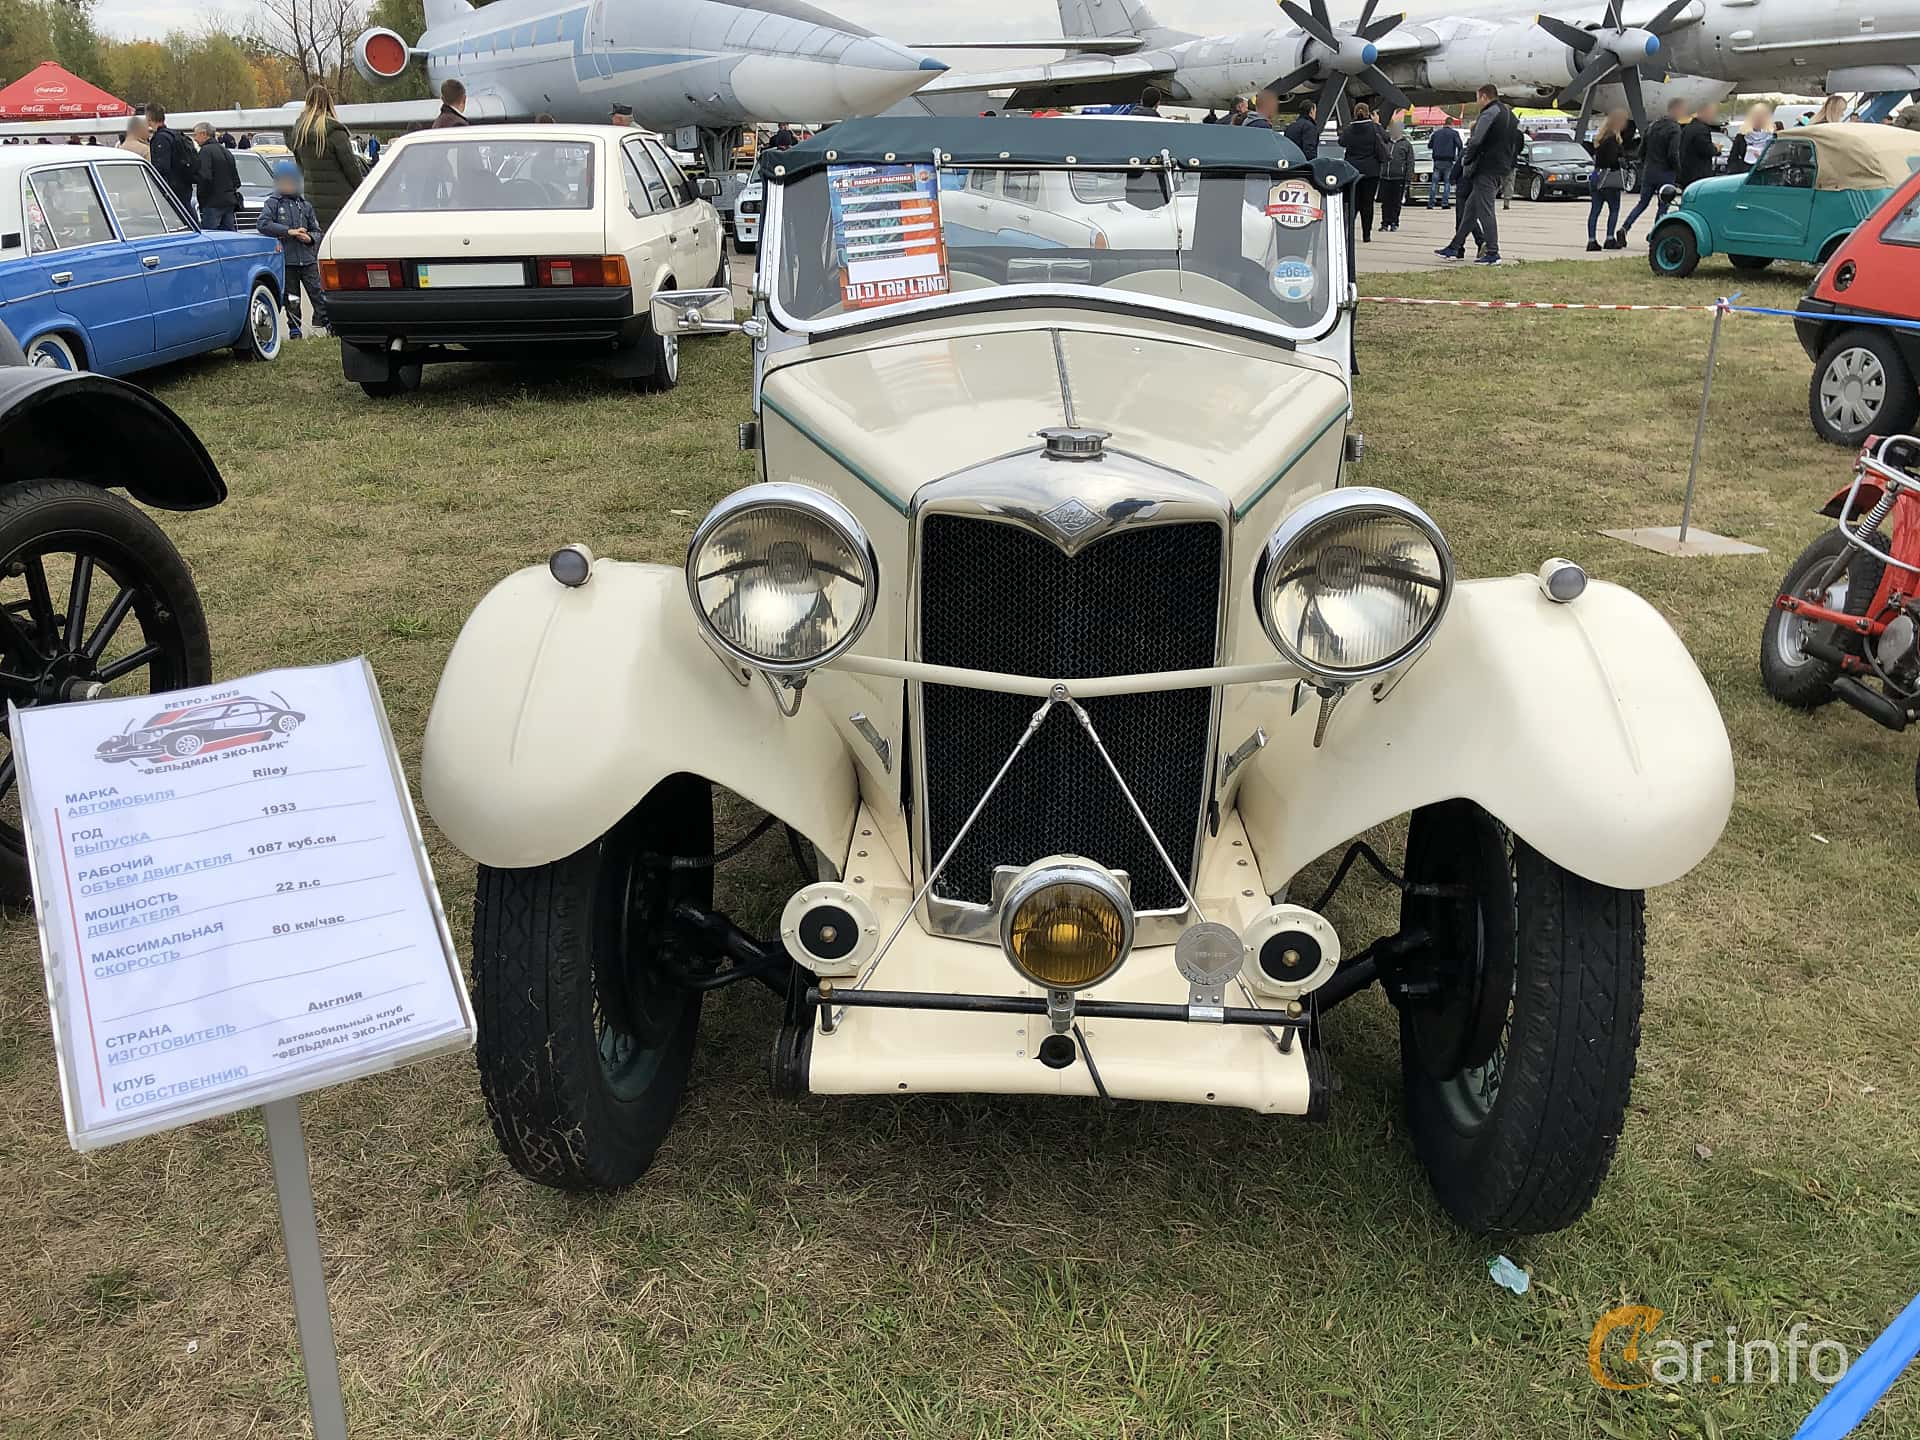 Riley 9 Cabriolet 1.1 Manuell, 29hk, 1933 at Old Car Land no.2 2019